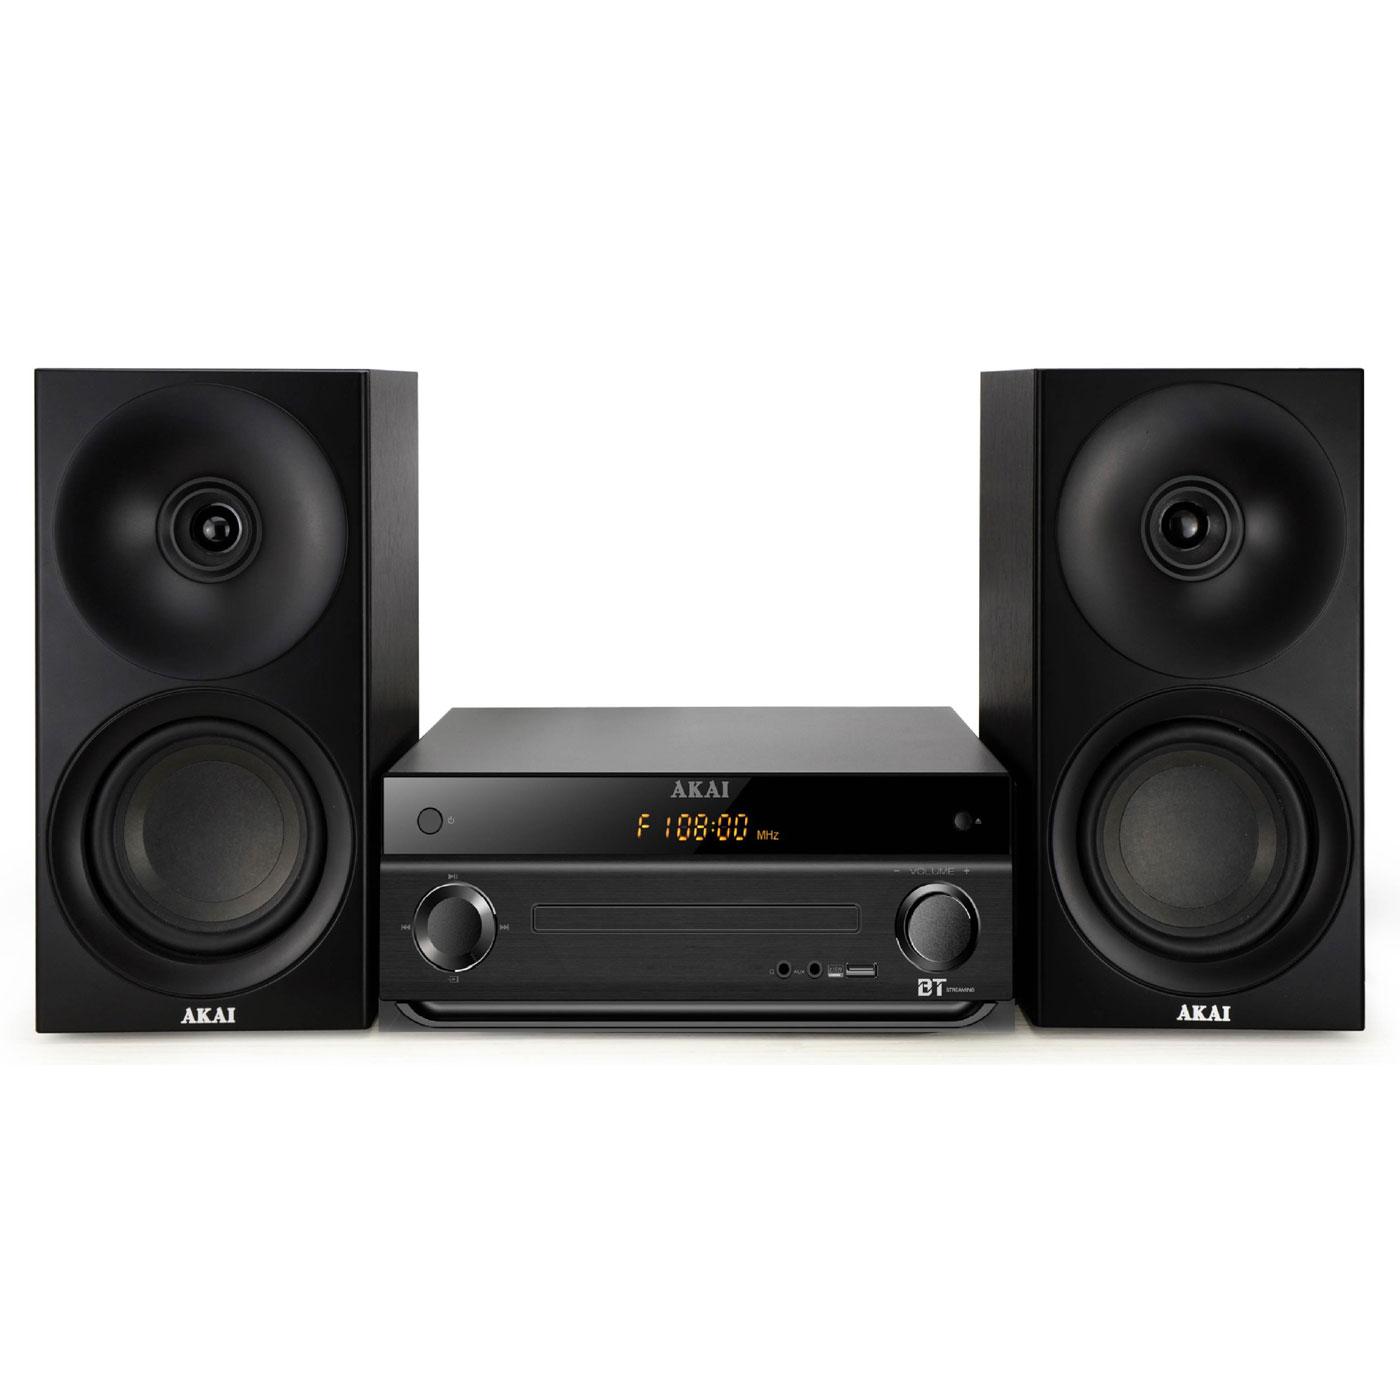 Chaîne Hifi Akai AM-301K Noir Micro-chaîne CD MP3 Bluetooth et USB